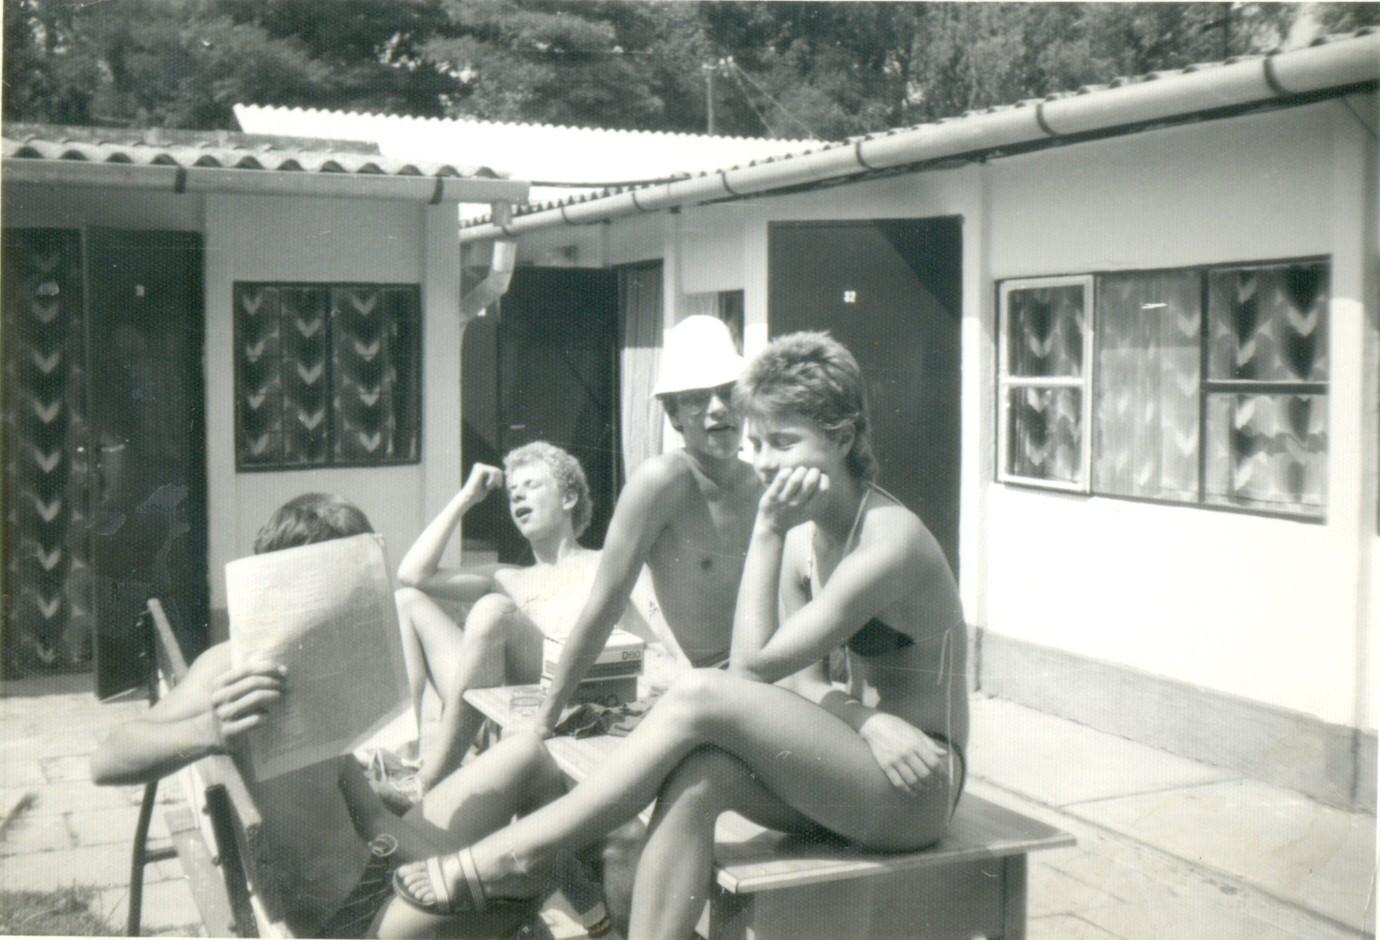 1984_balaton-mariafurdo_kilian-tabor.jpg